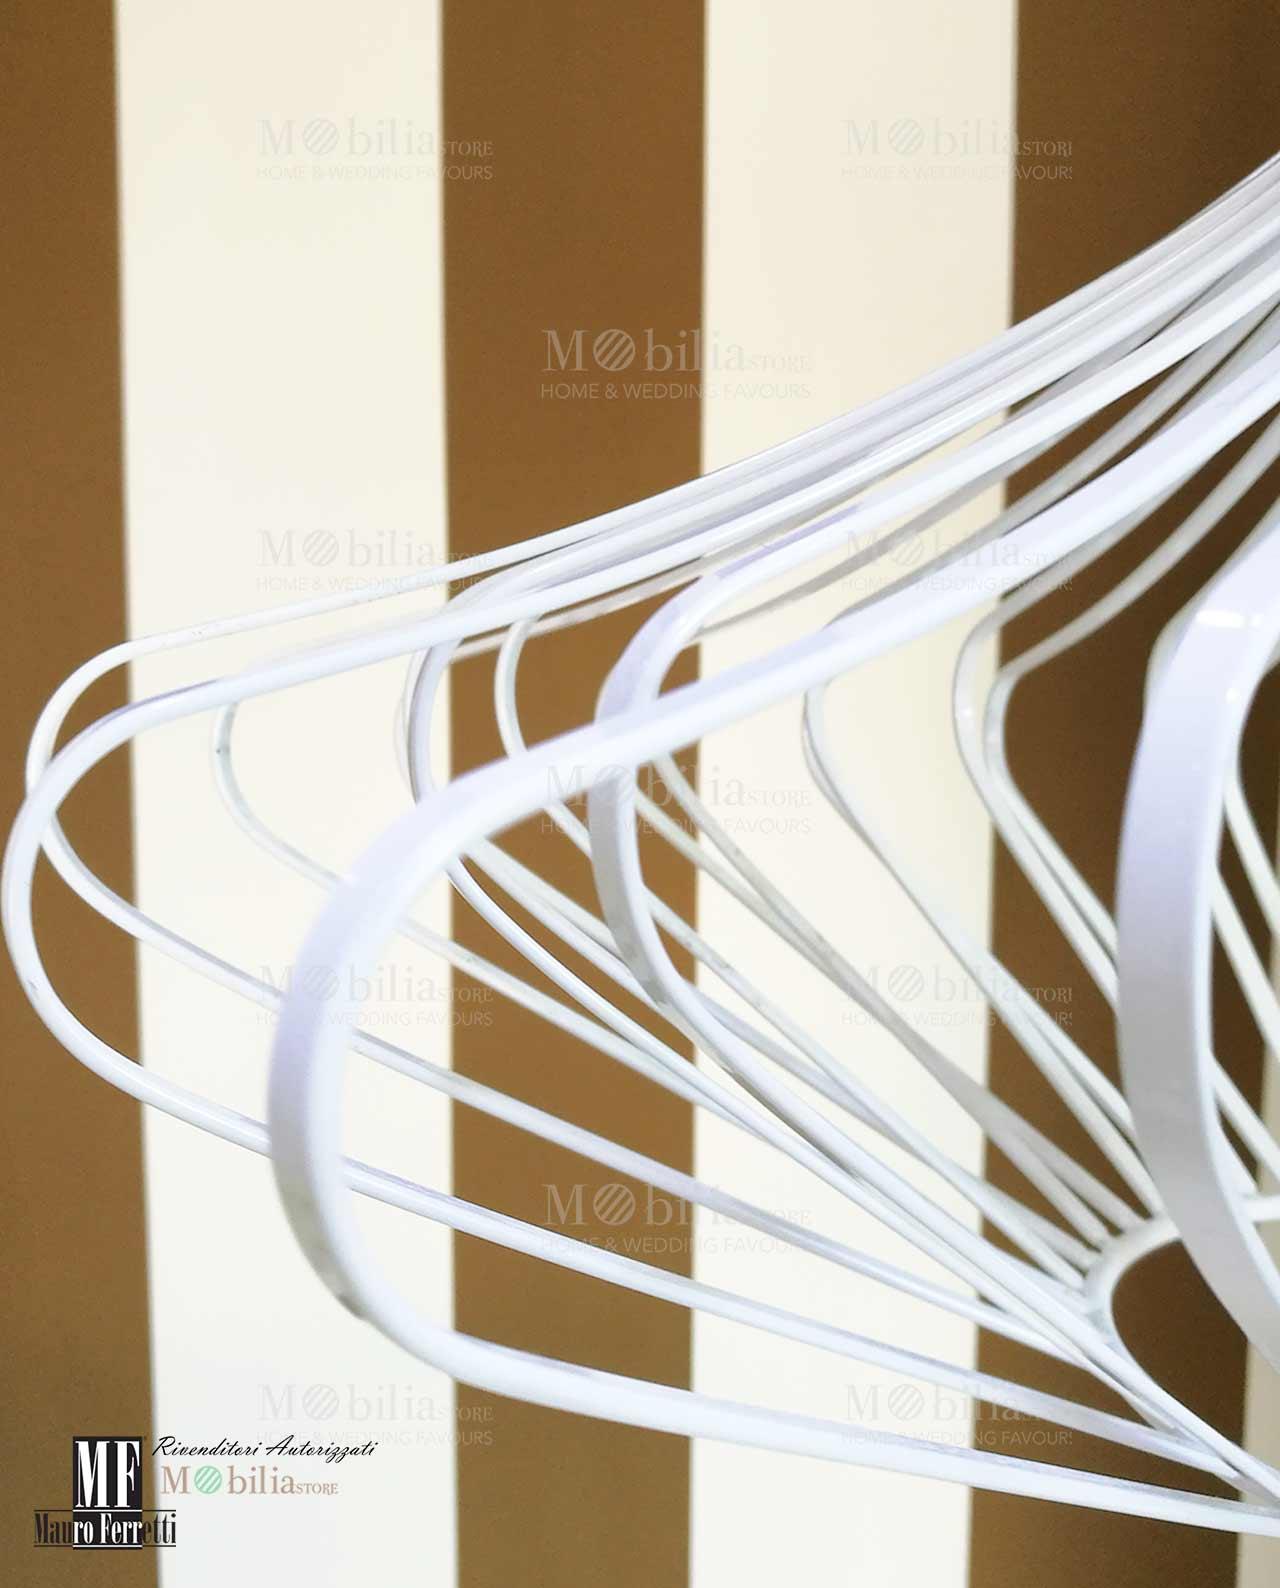 Lampadario moderno bianco – Mobilia Store Home & Favours